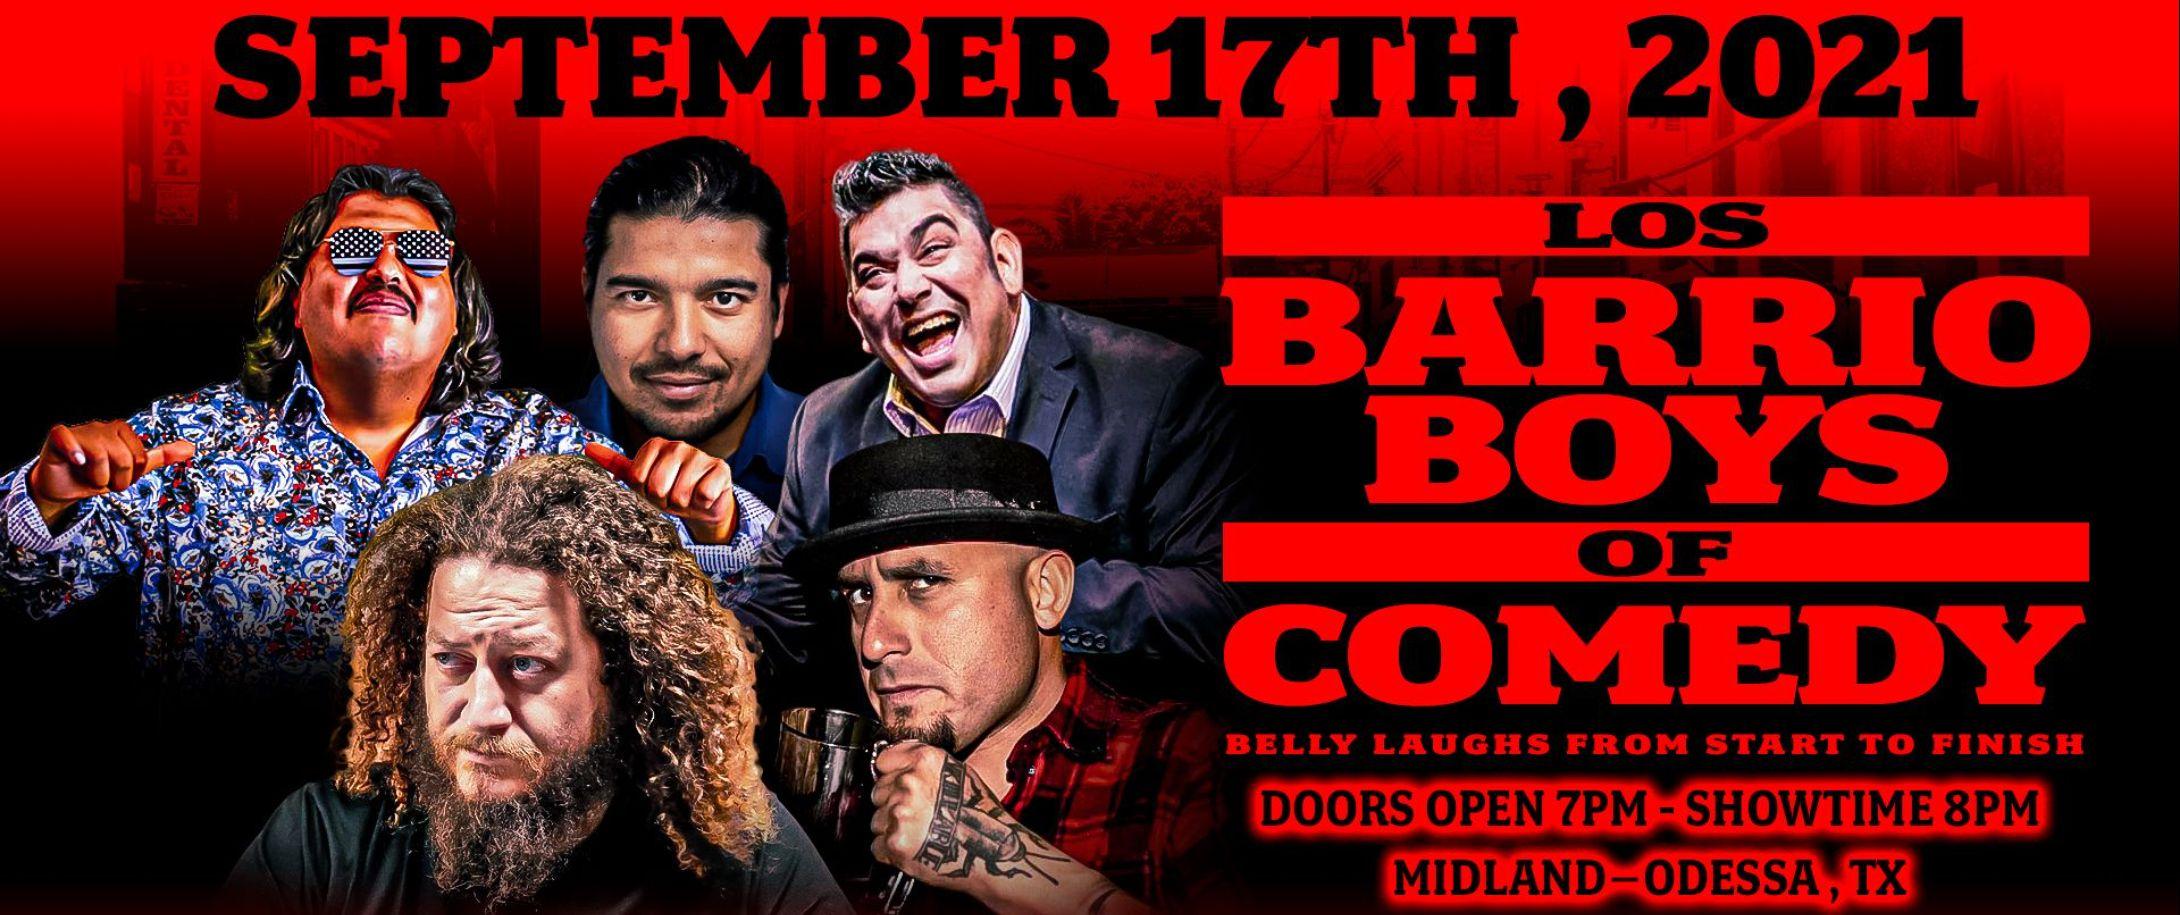 Raymond Orta y Los Barrio Boys of Comedy